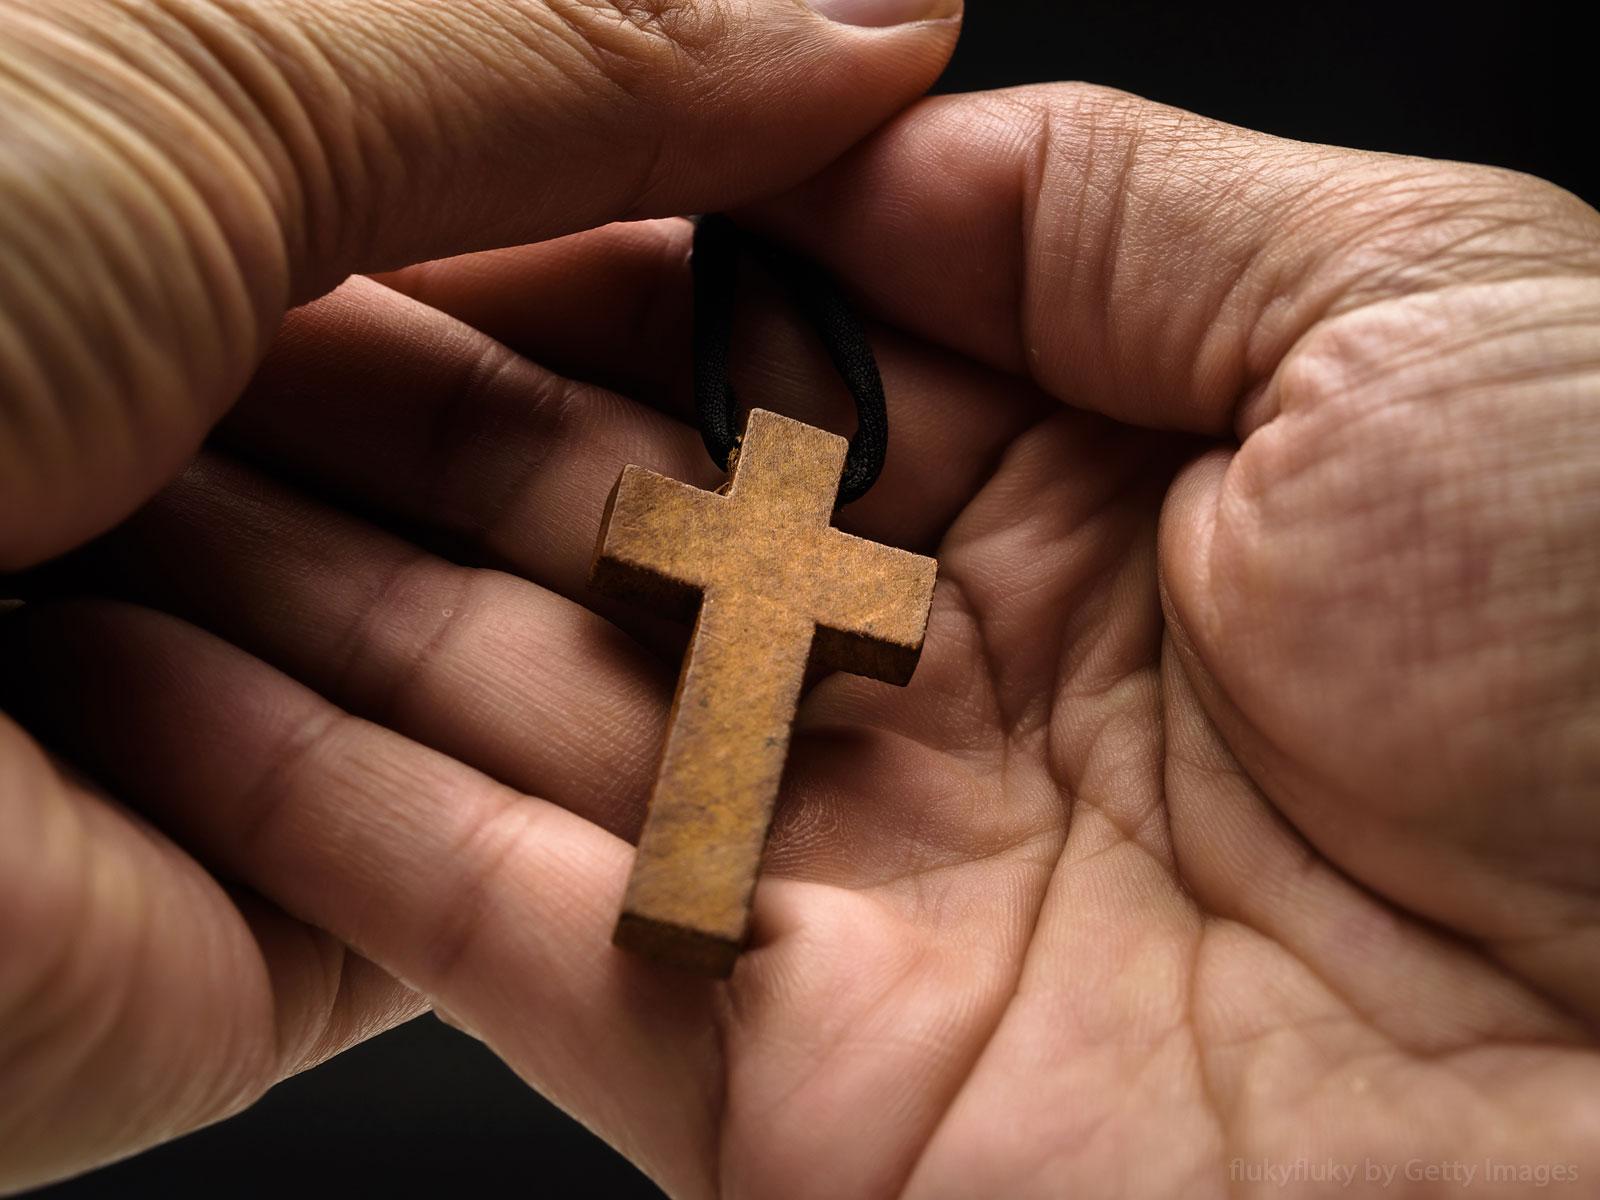 como-viver-a-santidade-na-vida-cotidiana